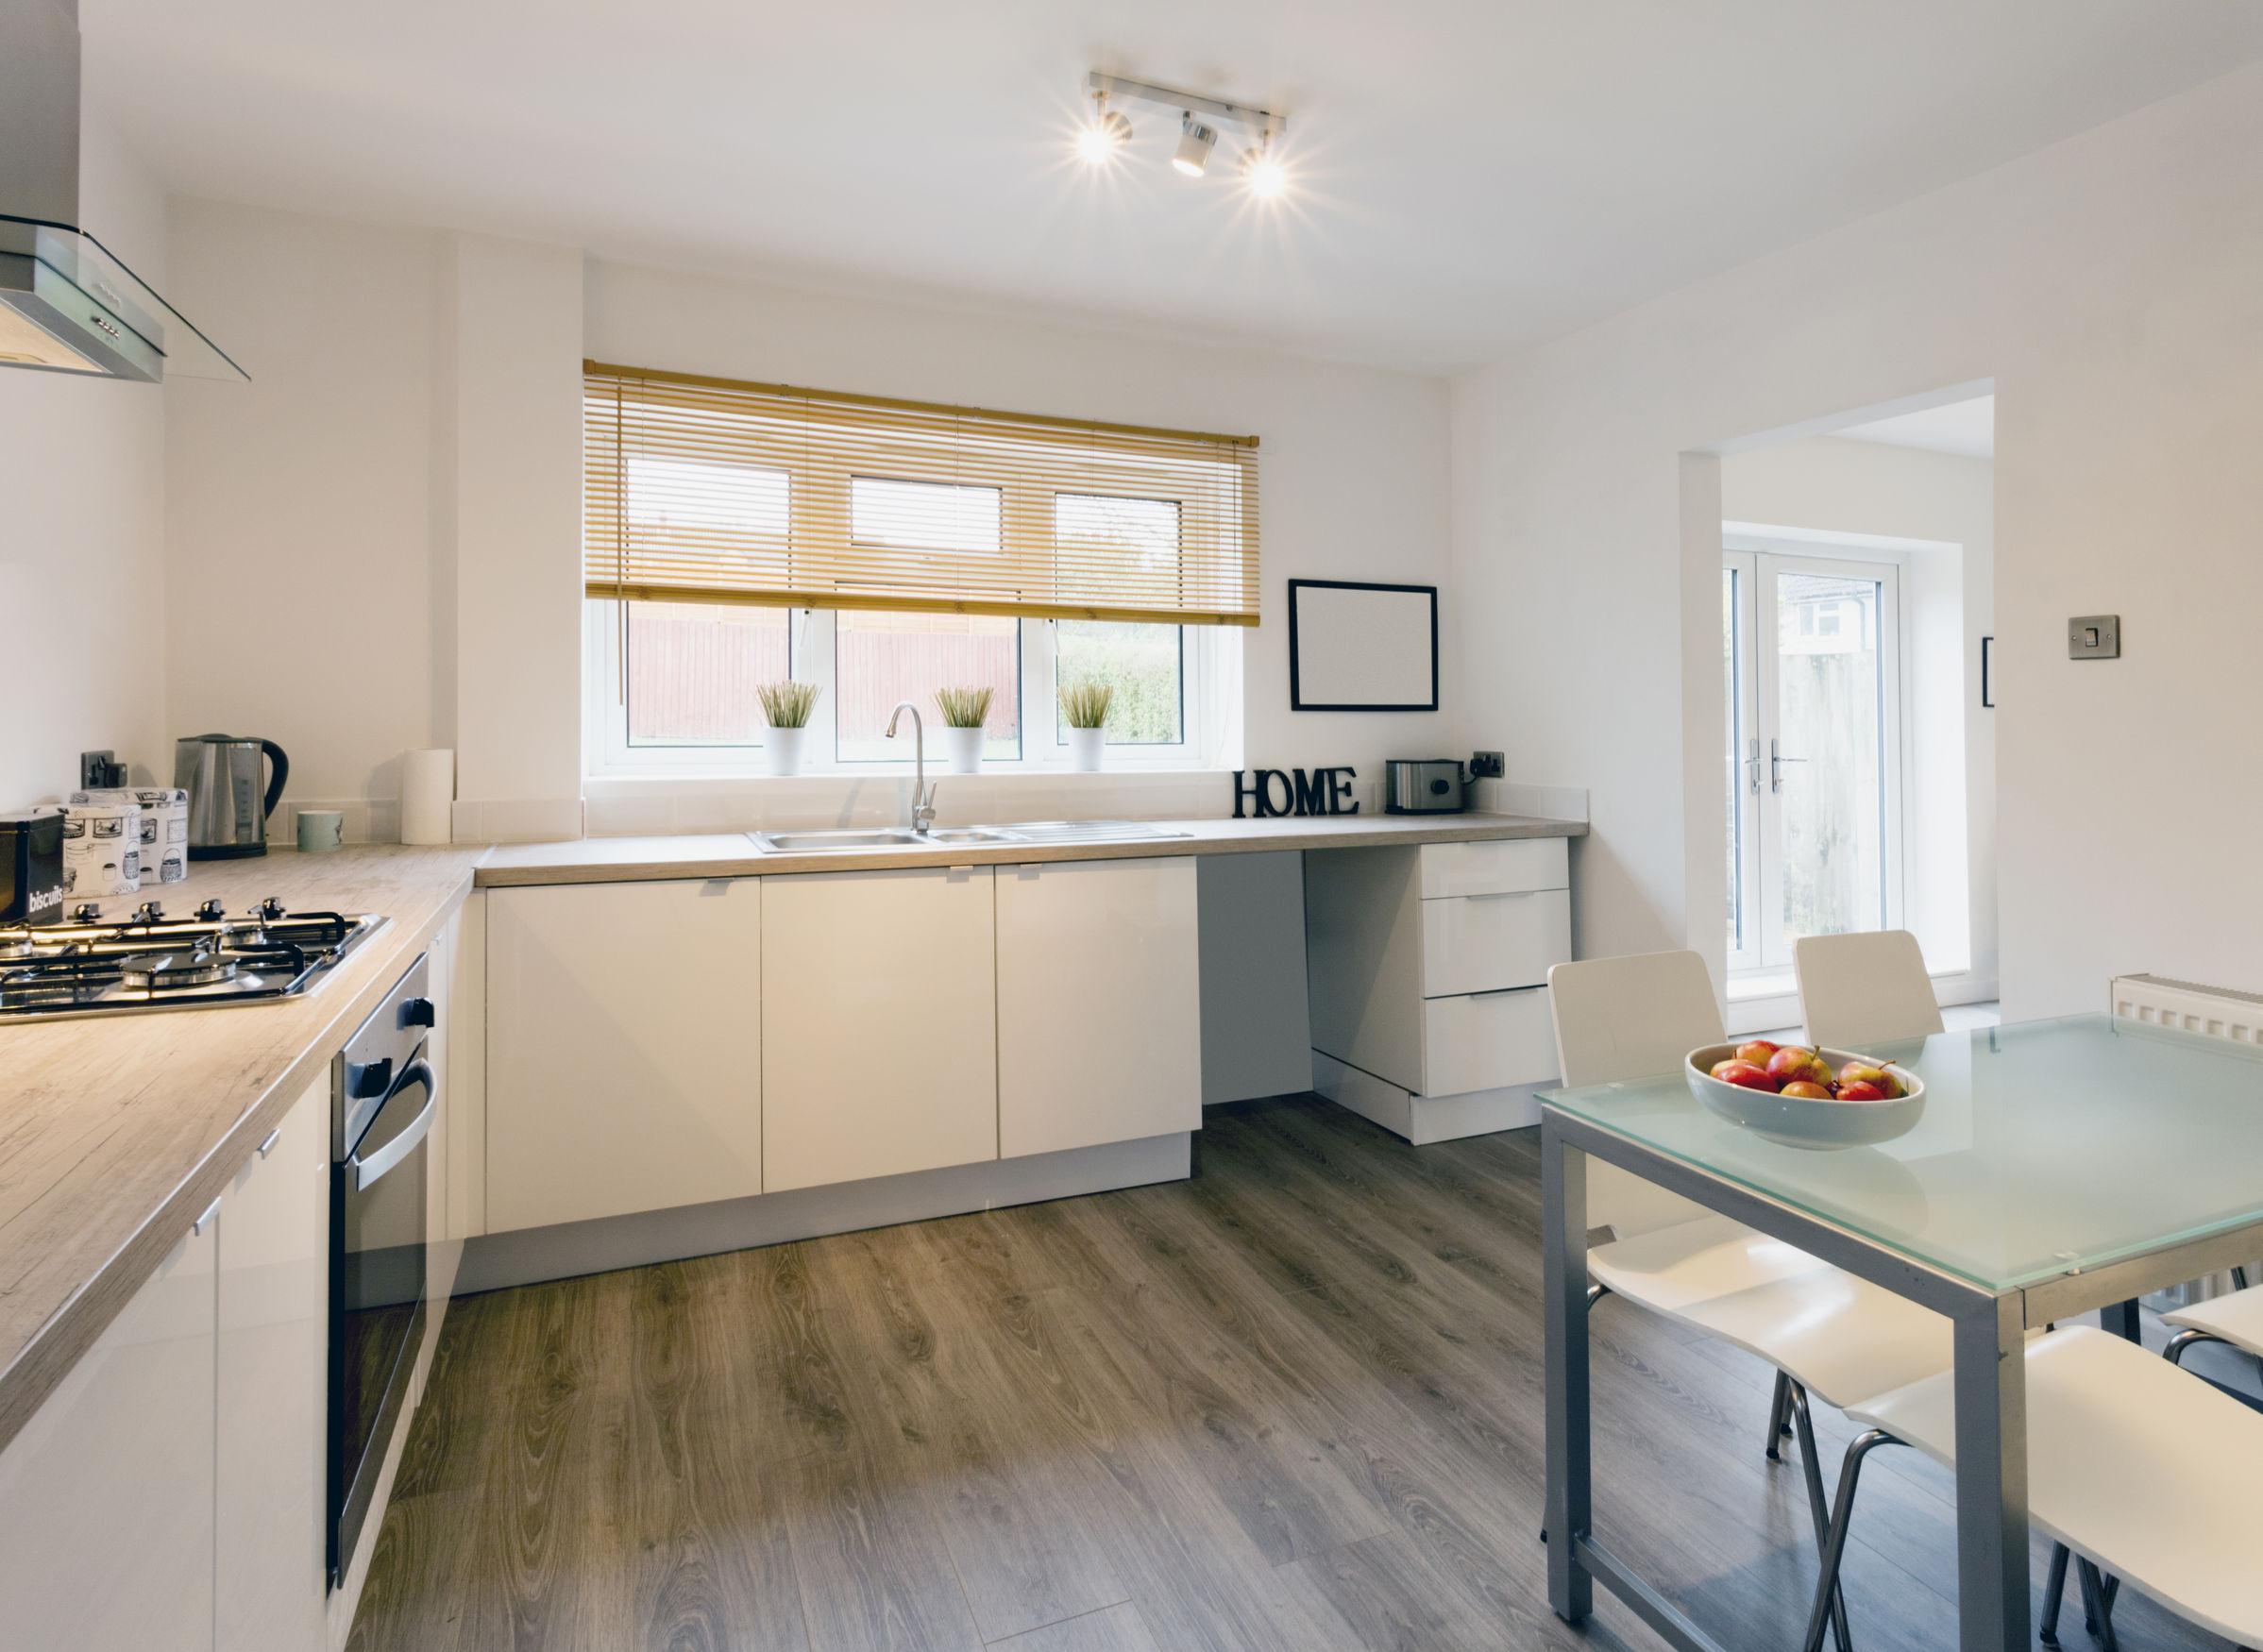 laminate flooring in kitchen top six reasons to select laminate kitchen flooring for your home MMZOCLQ